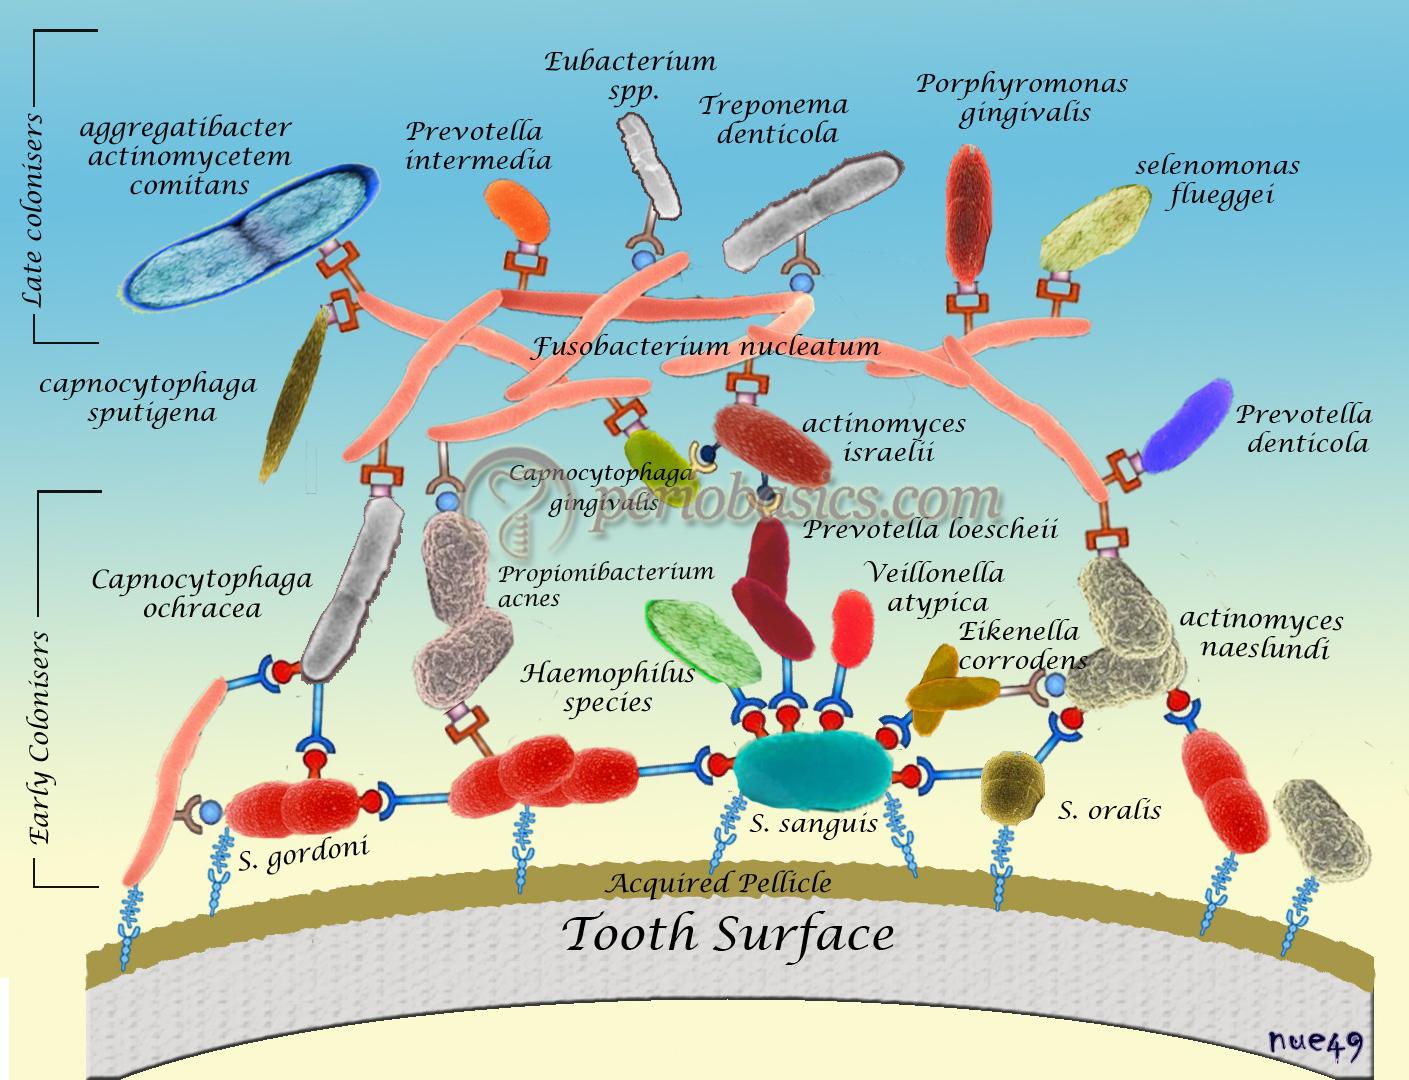 Diagrammatic representation of bacterial colonization in an established dental plaque.